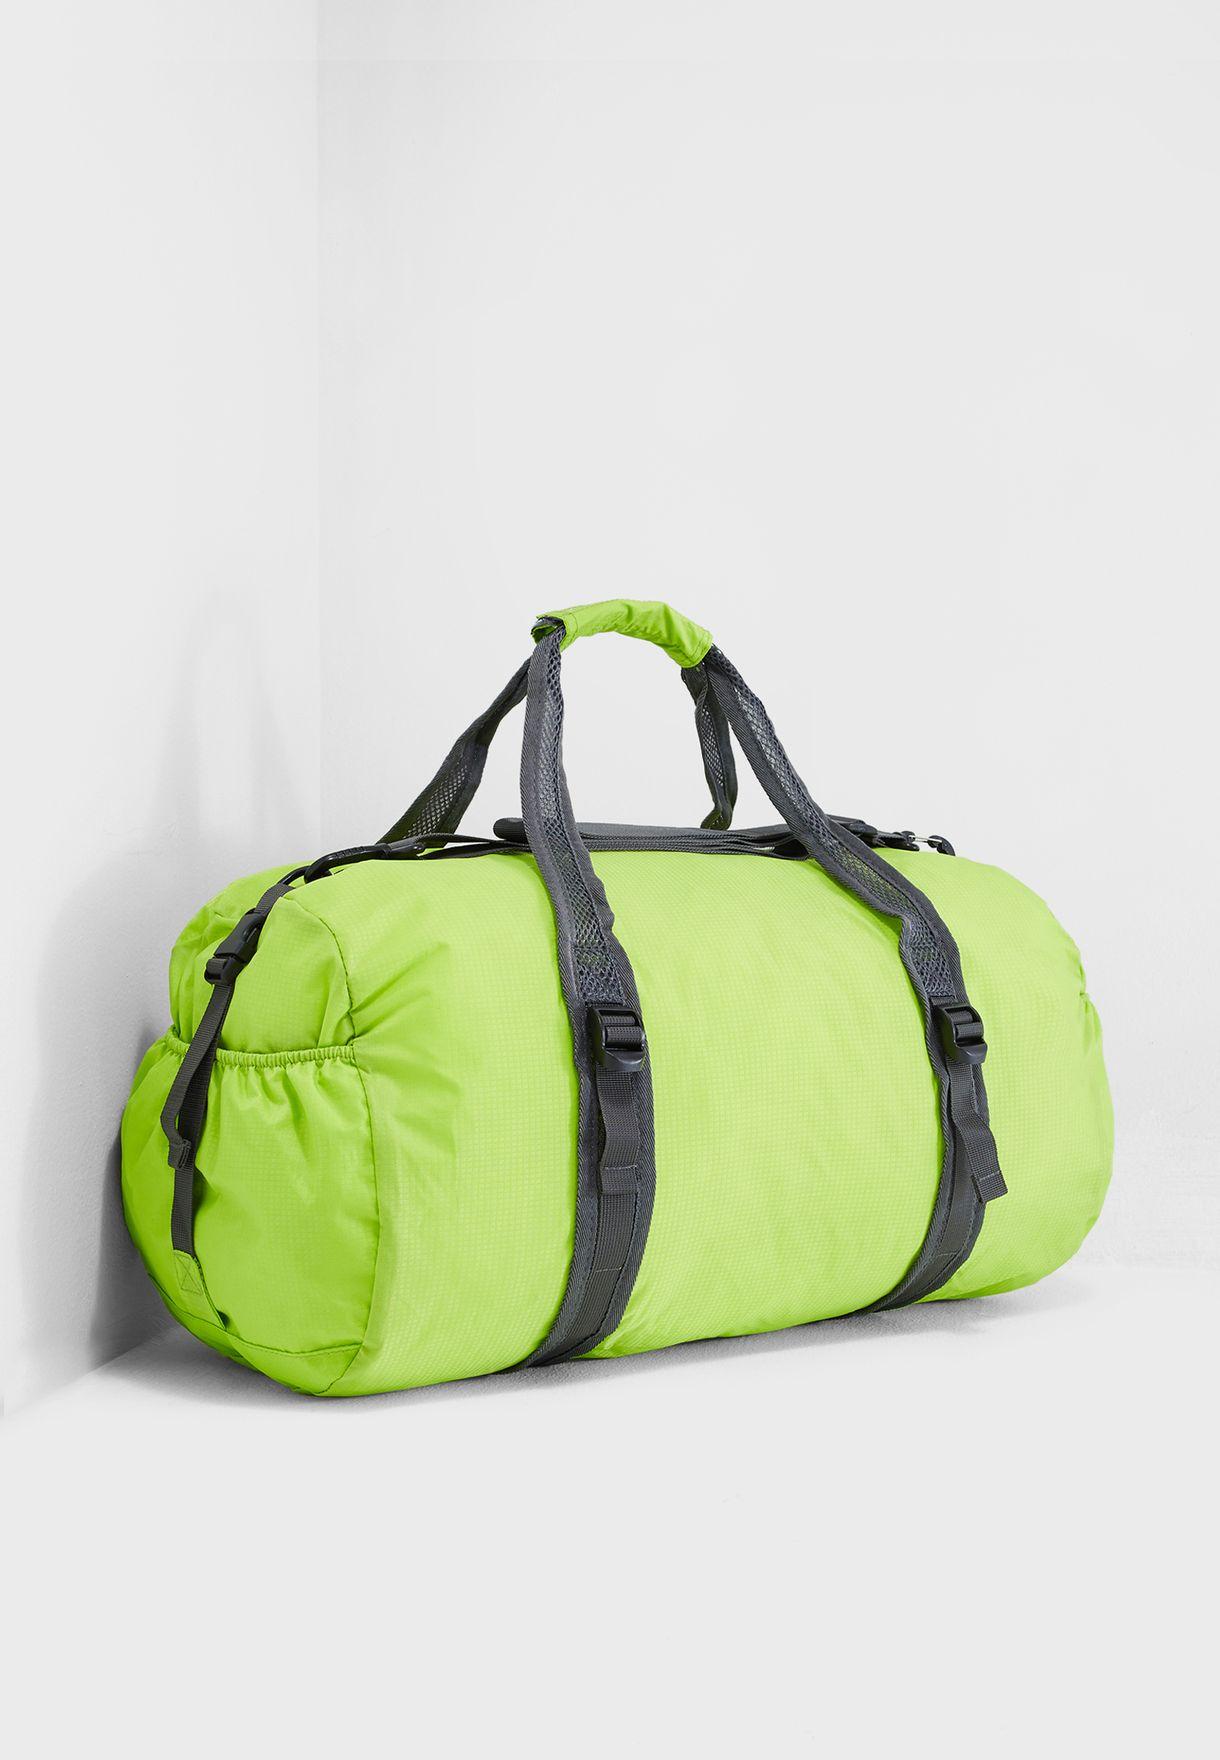 Shop Seventy five green Gym Duffel Bag JE103  for Men in UAE ... 448d7e1ad